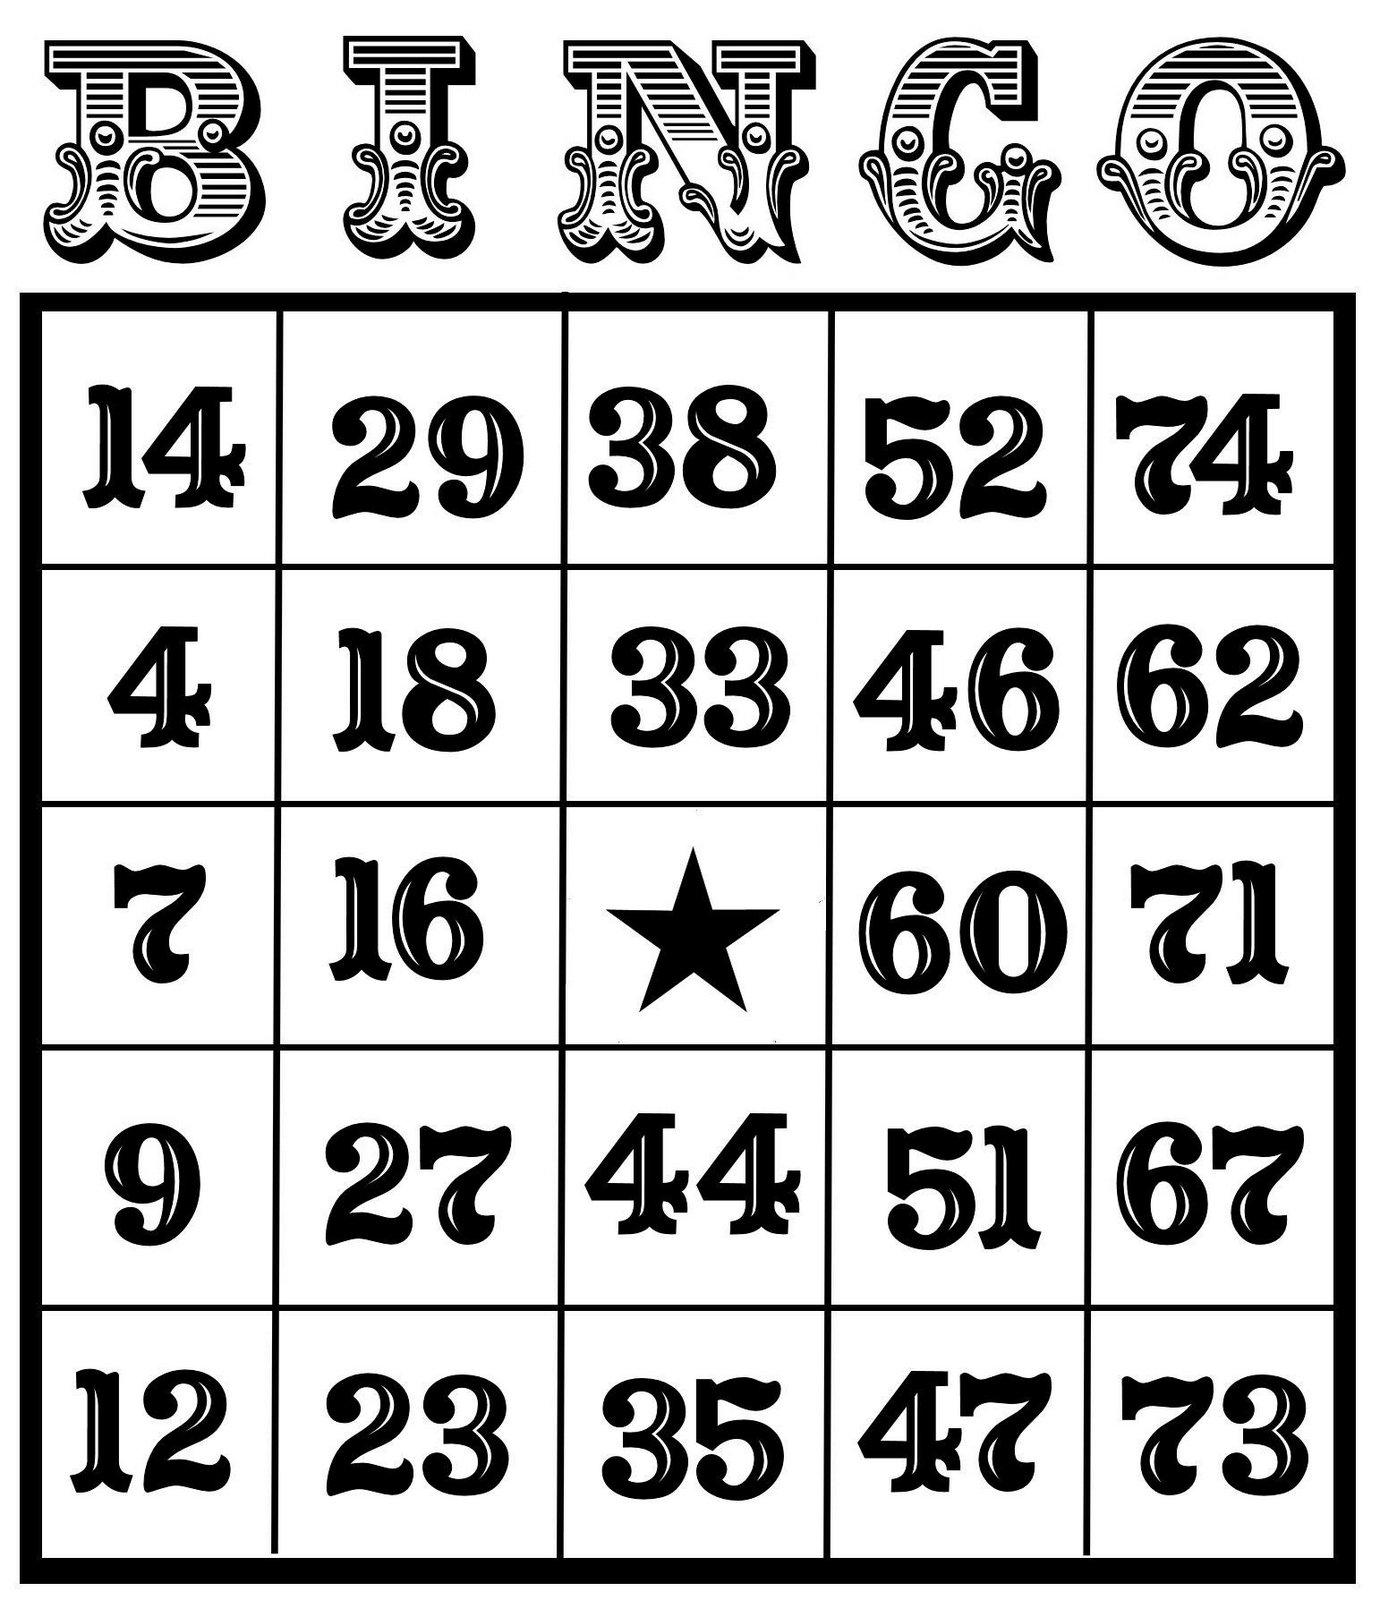 Download Christine Zani Bingo Card Printables To Share